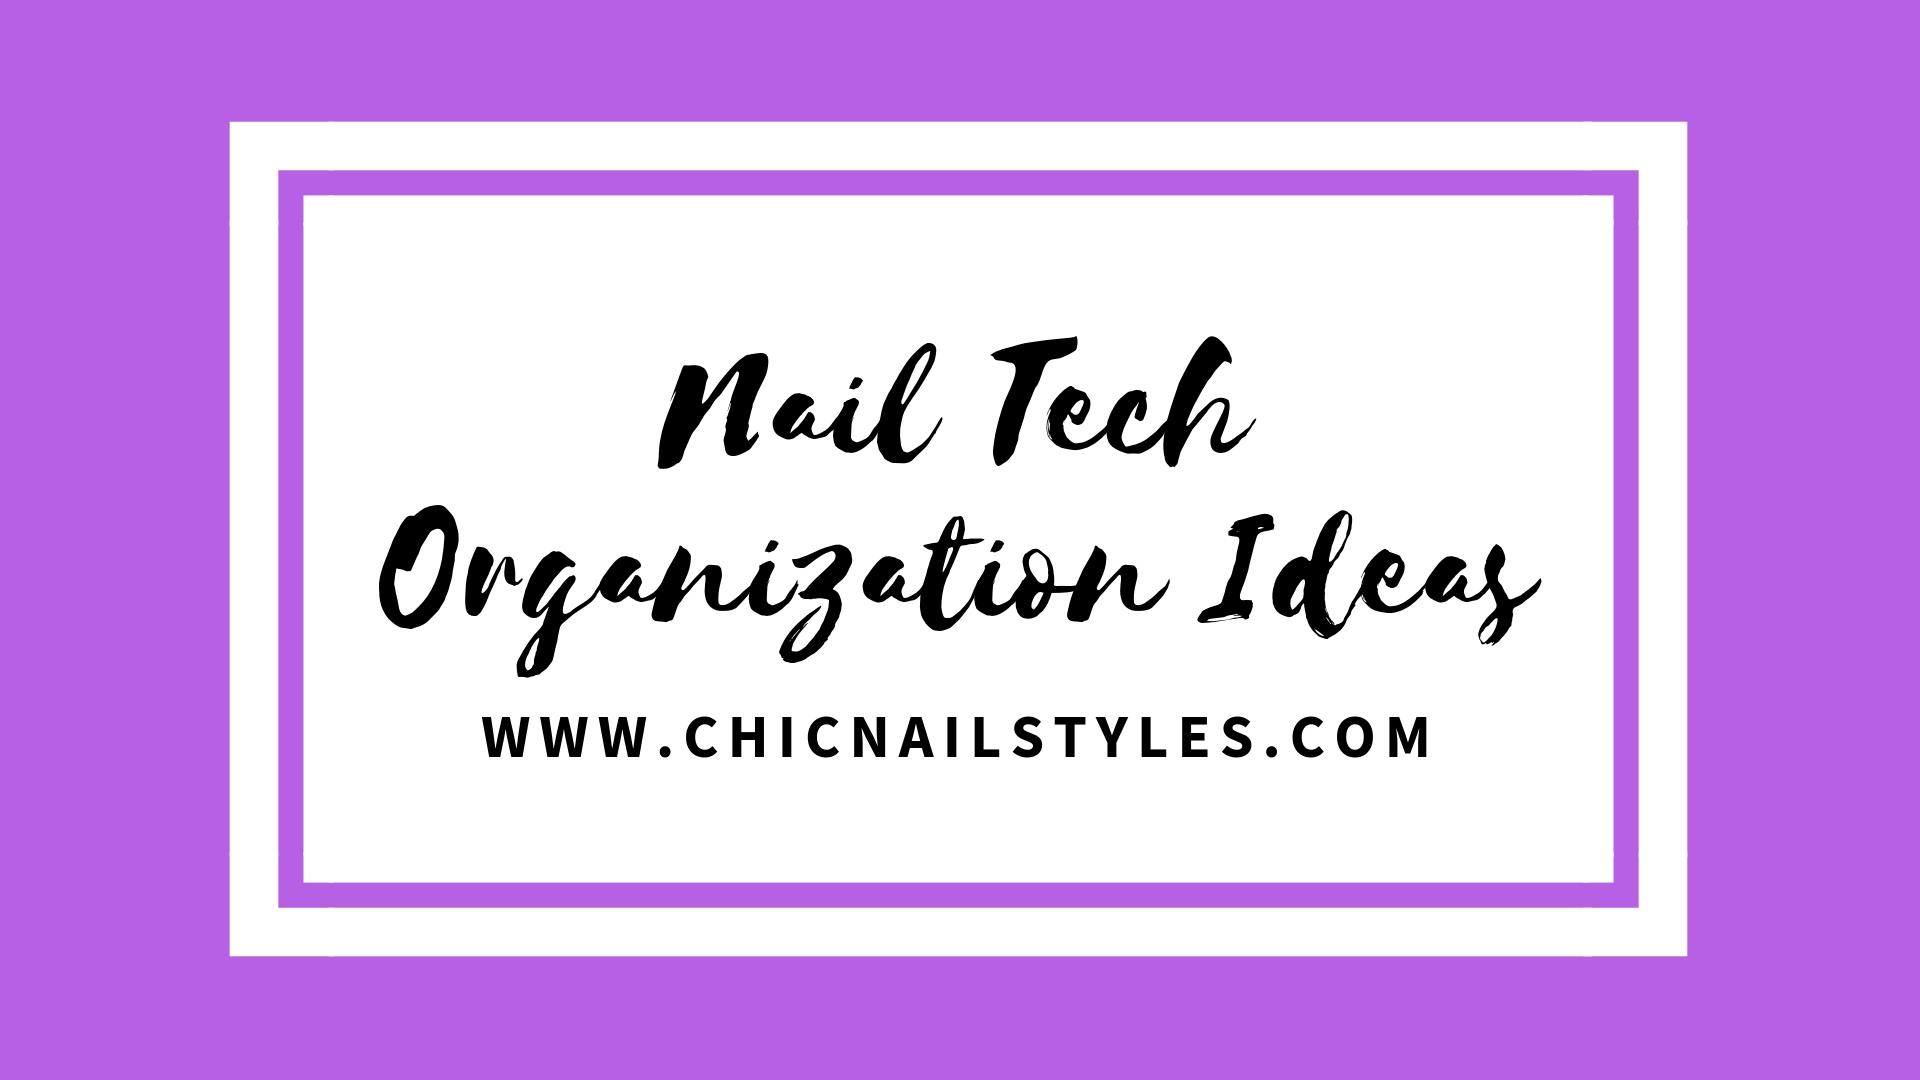 nail tech organization